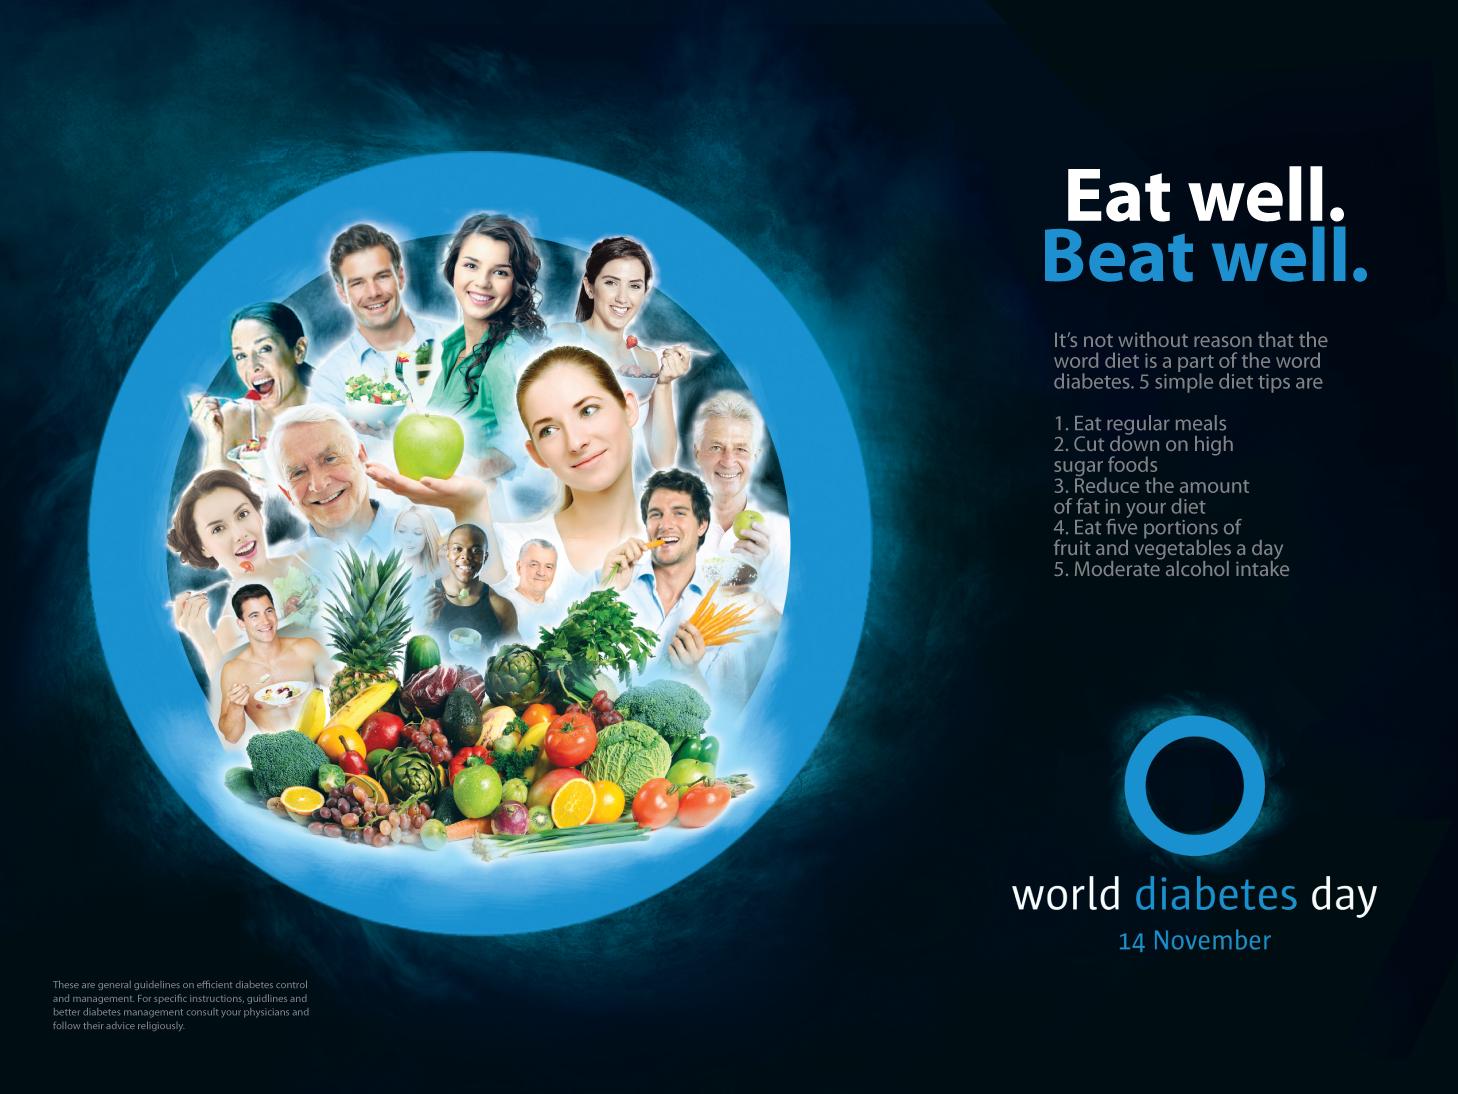 World Diabetes Day 2014